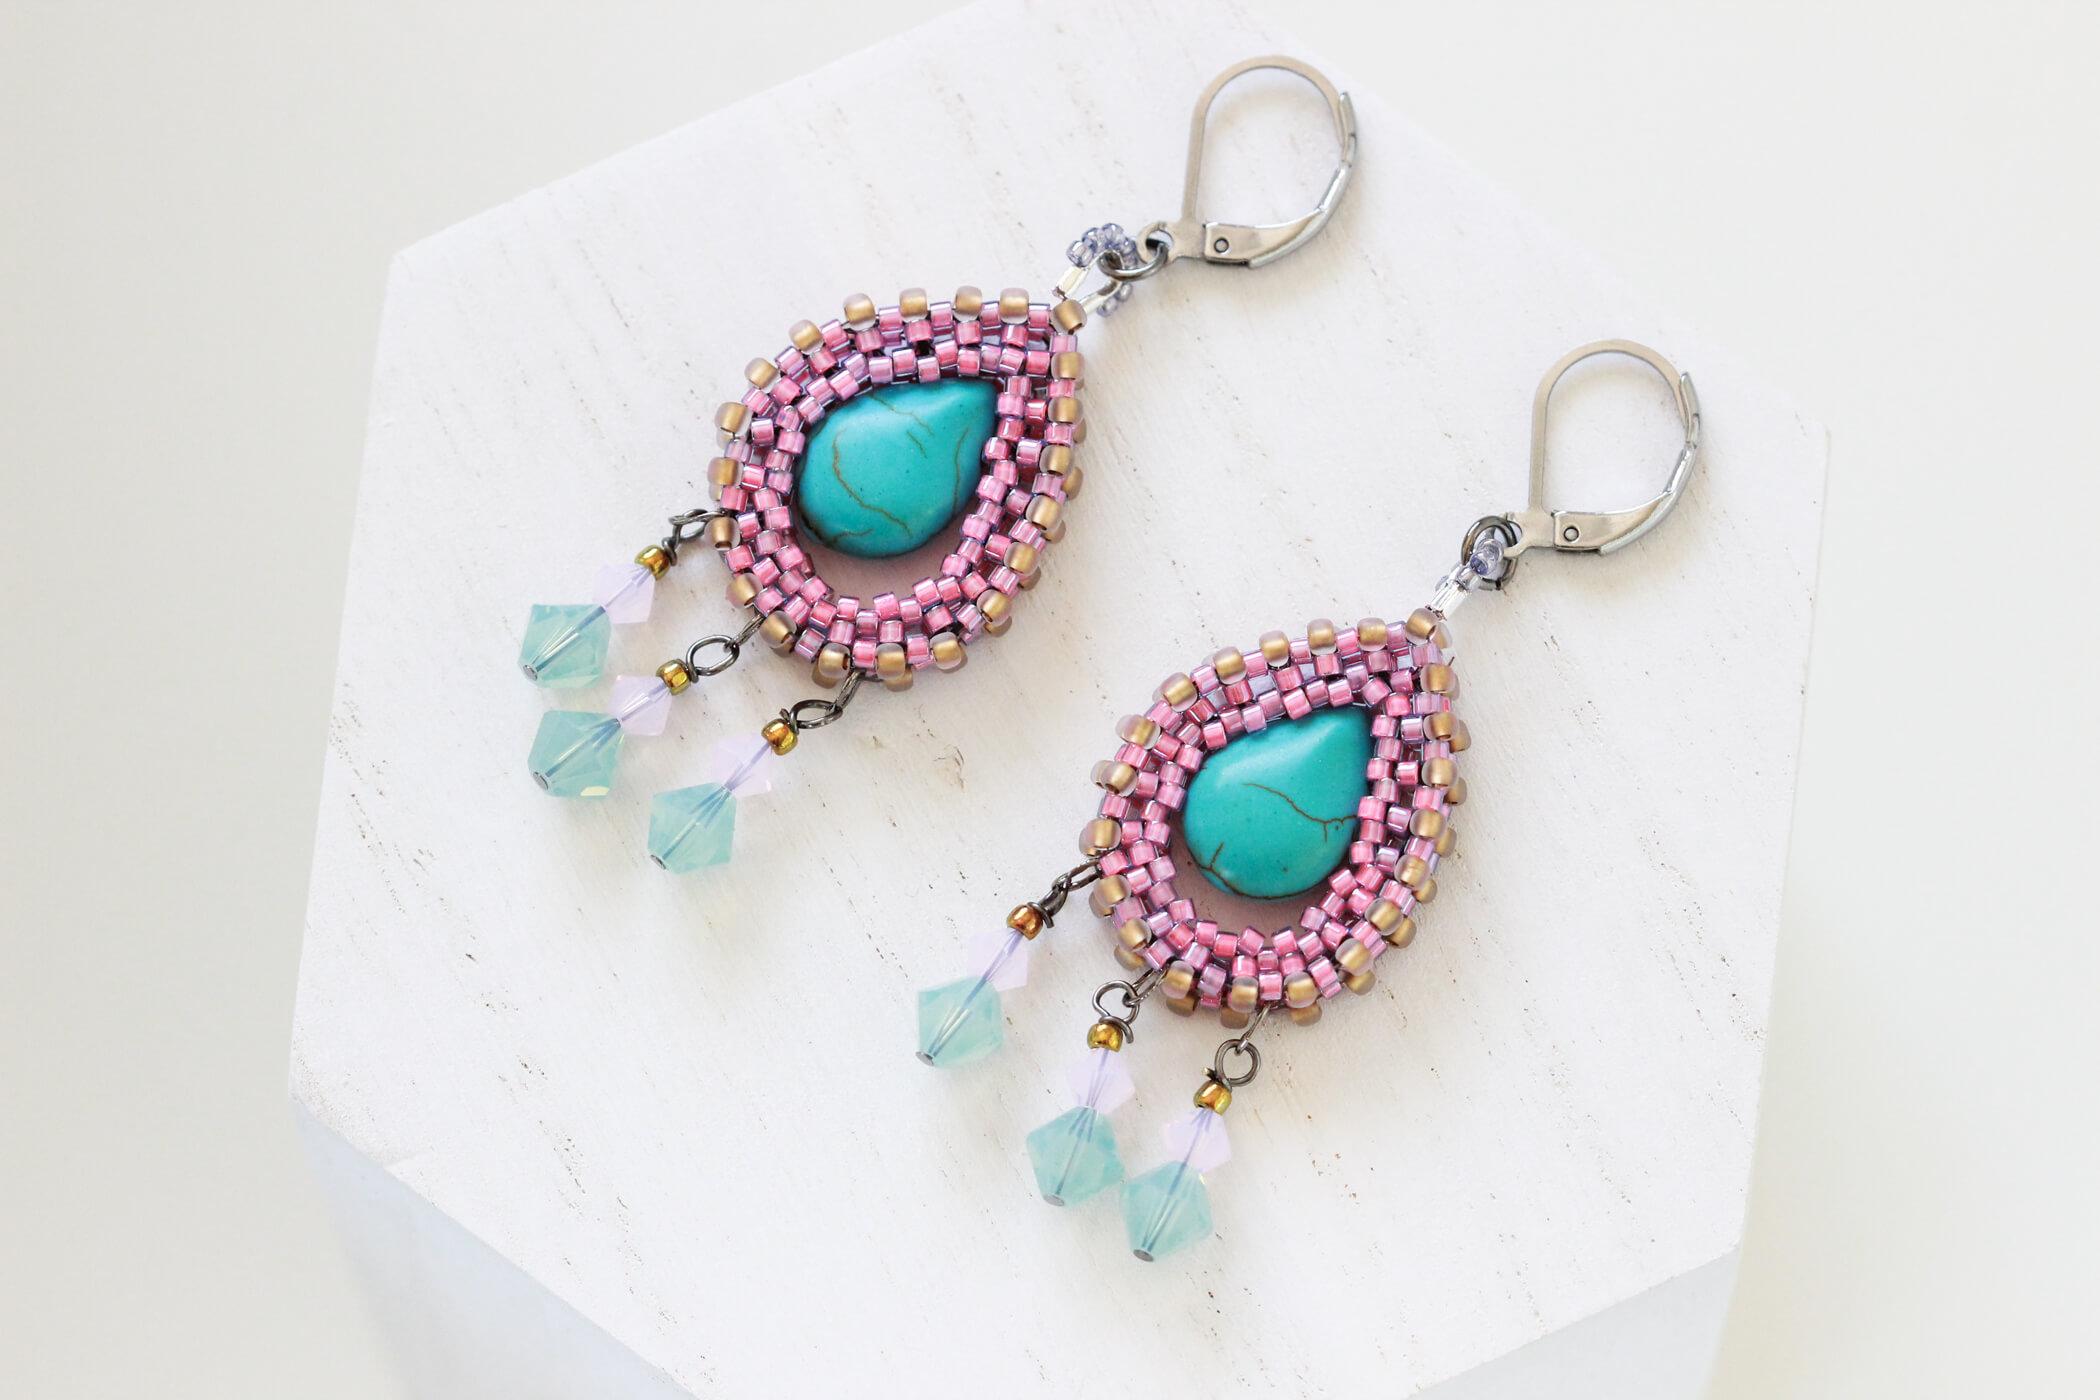 Mexican Style Earrings – Dia De Los Muertos Earrings by Kaleidoscopes And Polka Dots